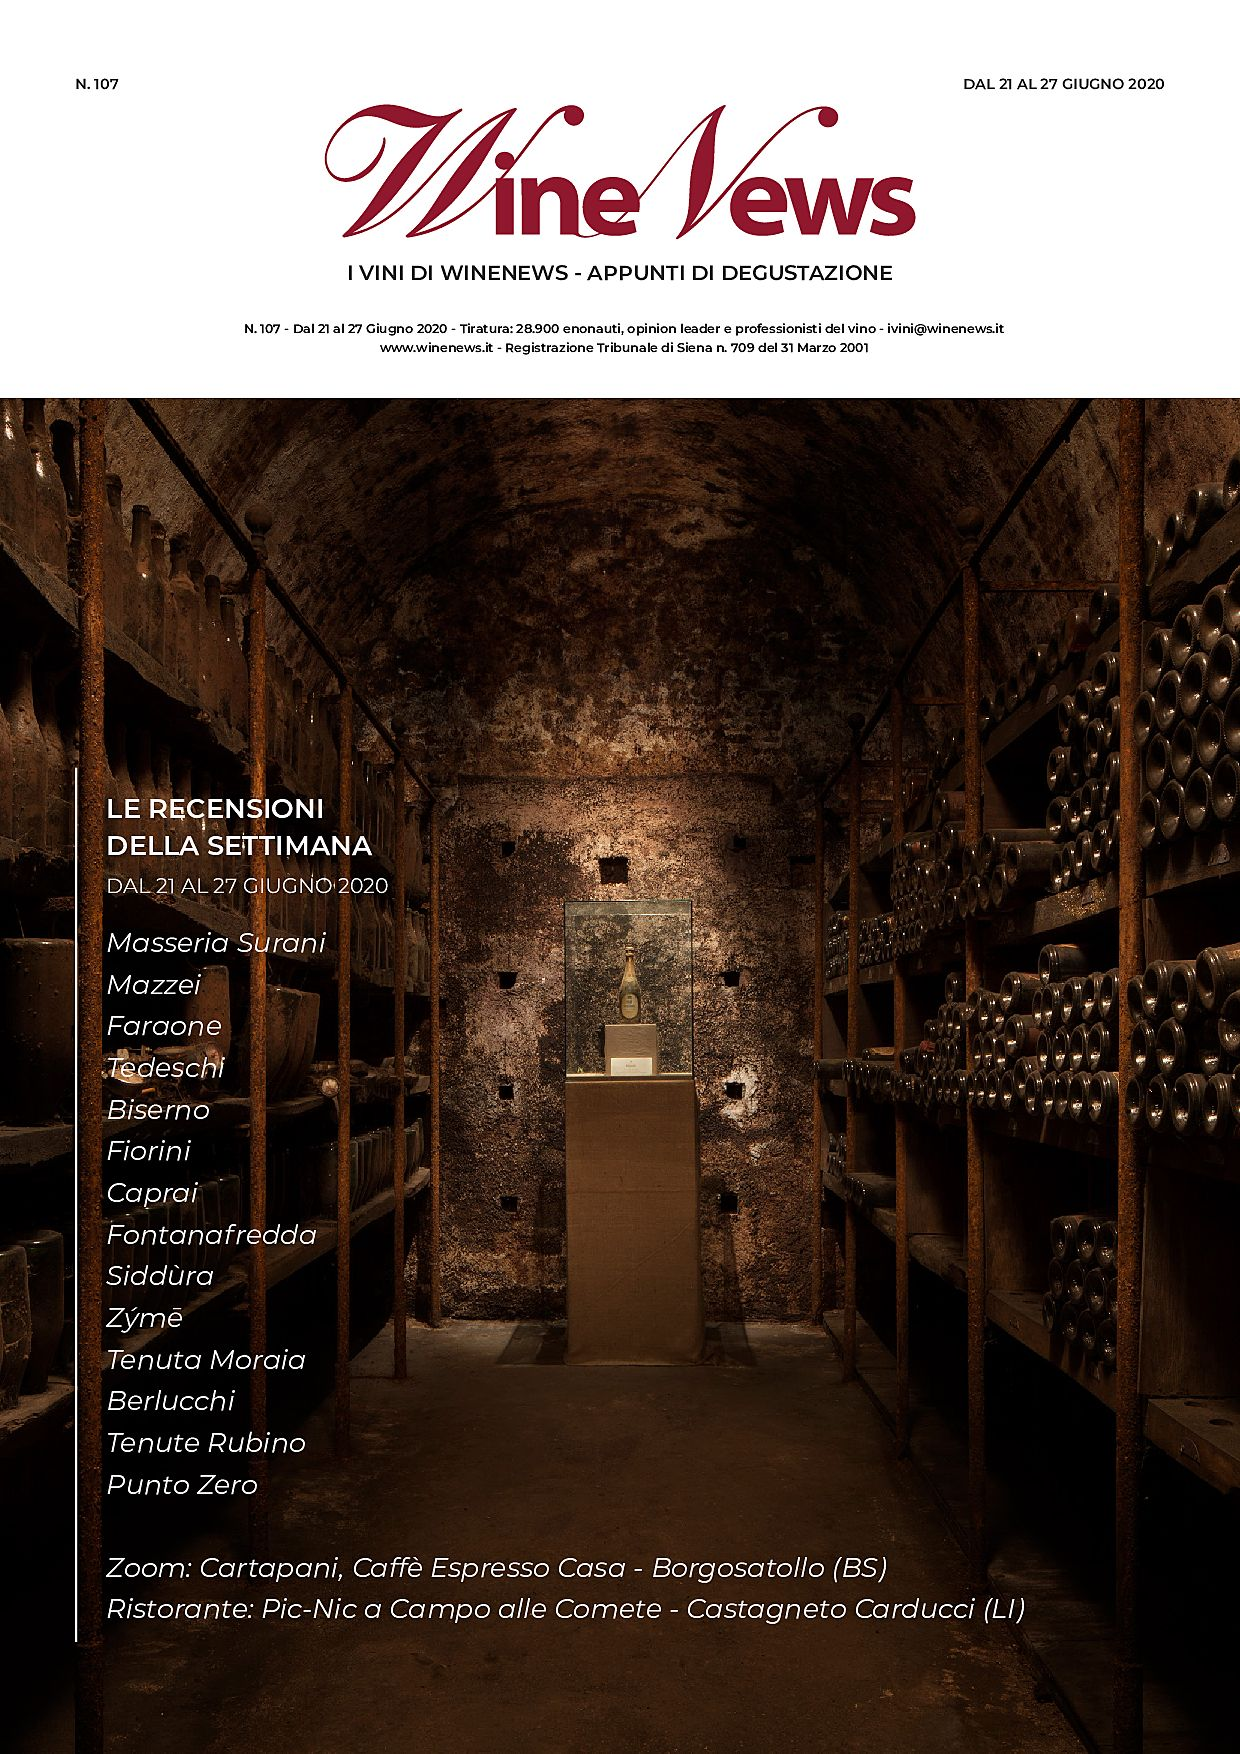 https://winenews.it/php/redirect_pdf.php?id=419317&t=1592583778